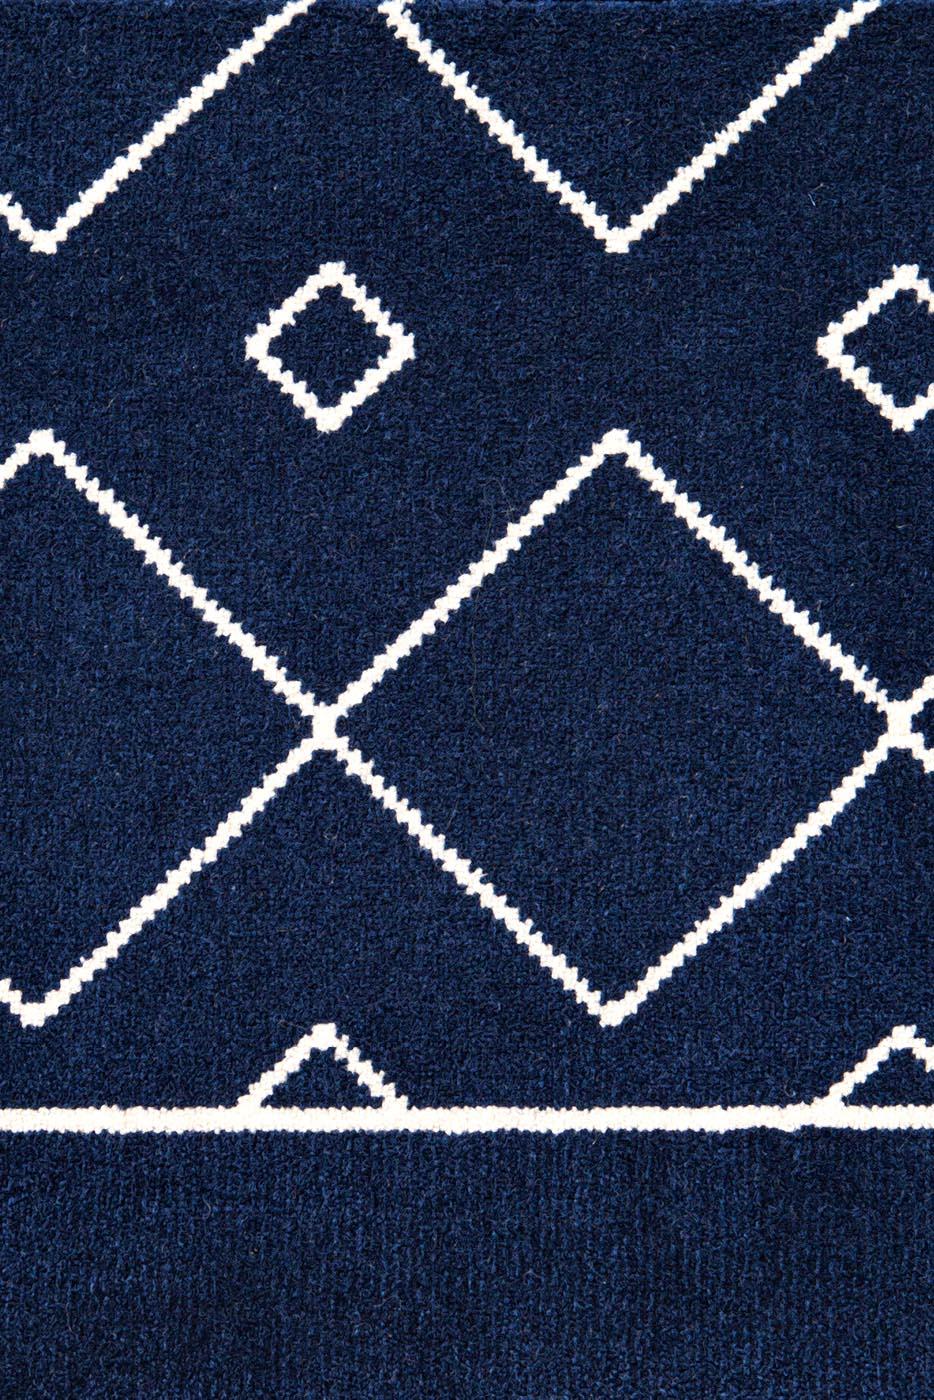 Carpet - Moquette Moby I by Pinton